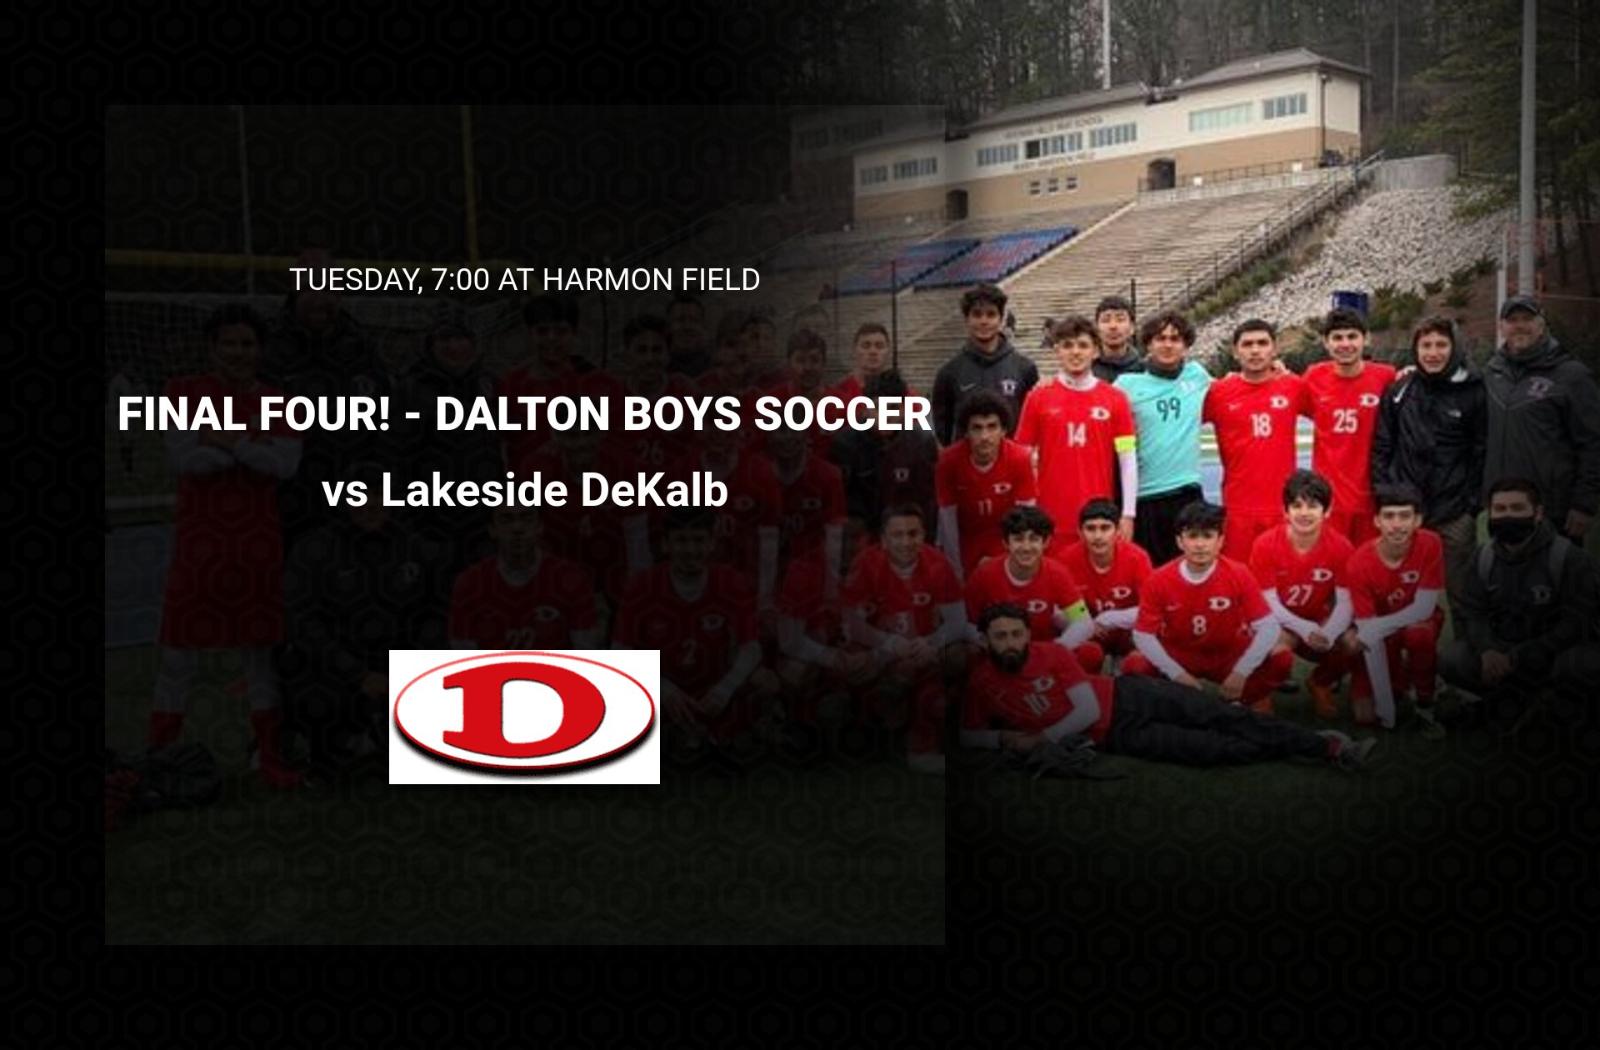 FINAL FOUR! Tuesday 7:00 at Harmon vs Lakeside DeKalb